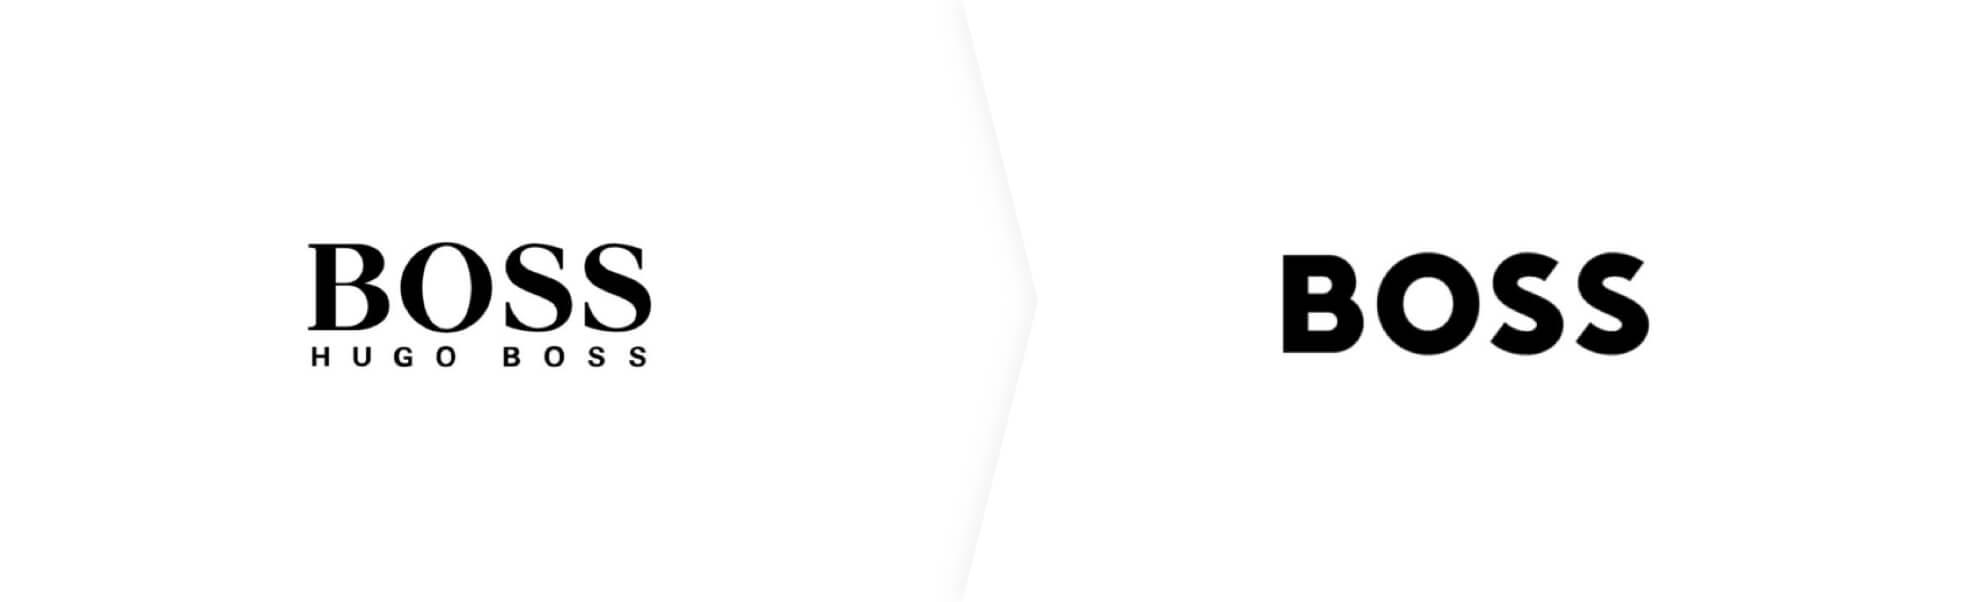 stare i nowe logo marki hugo boss